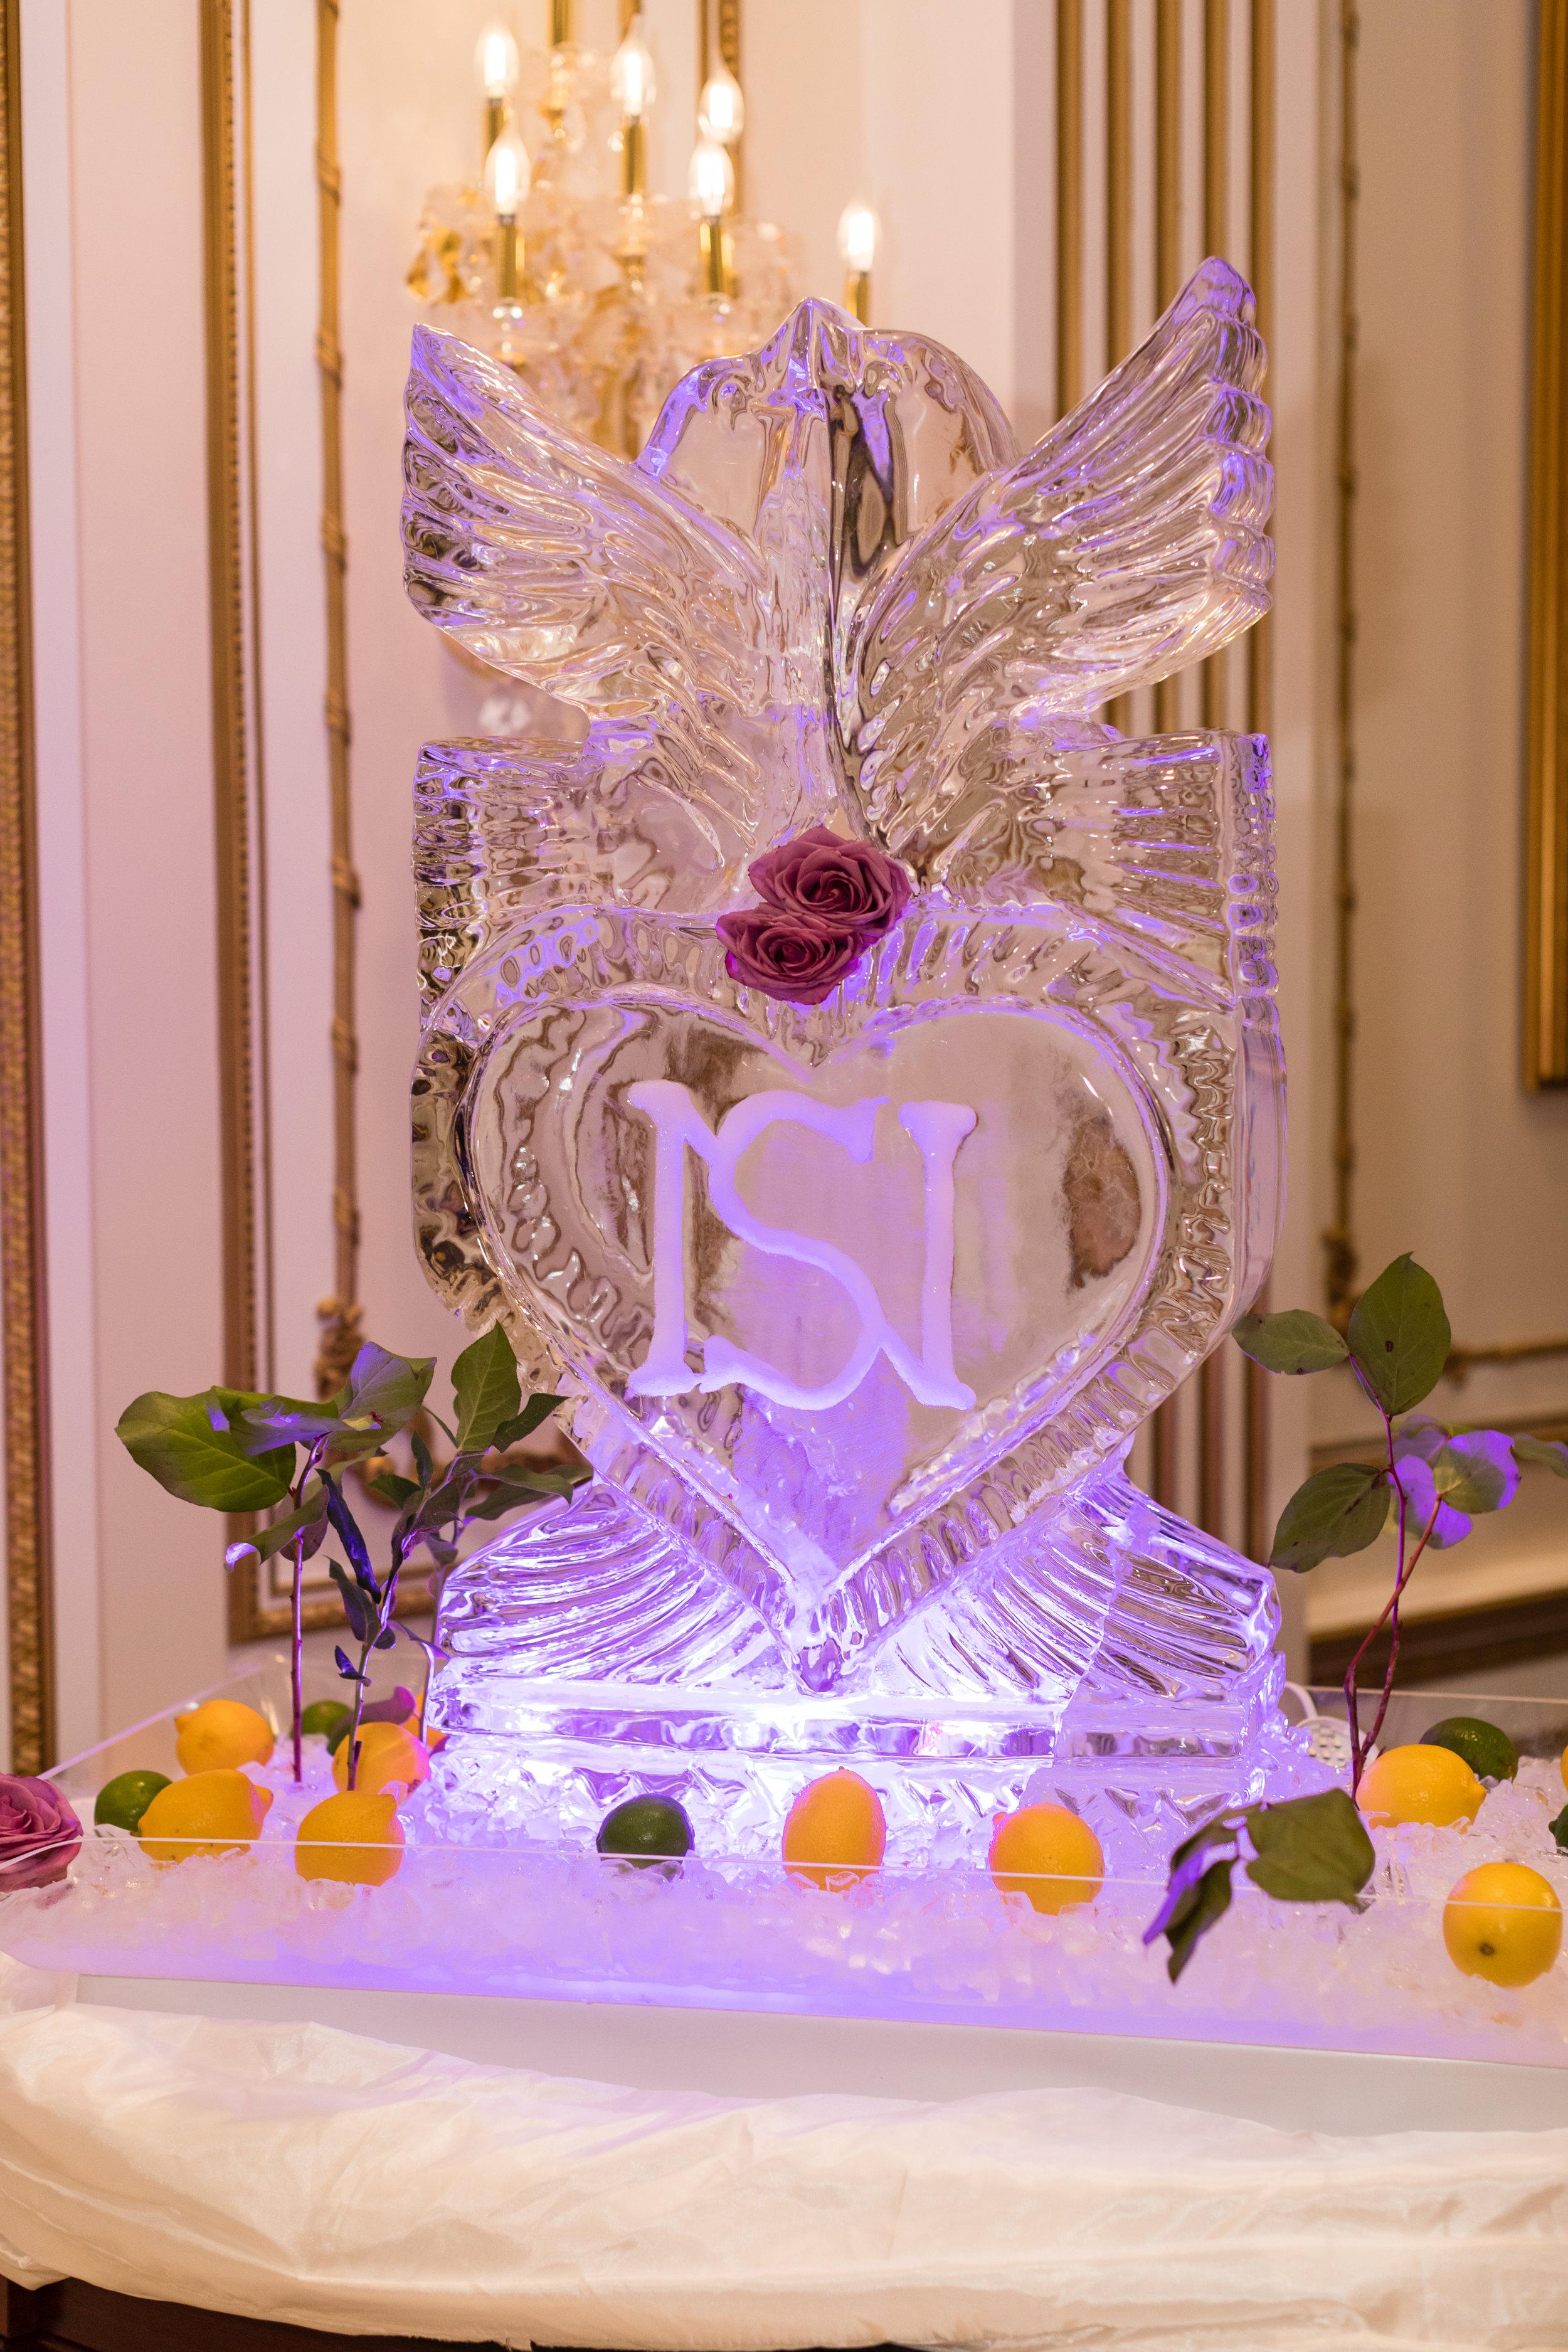 INDIAN WEDDING ICE SCULPTURE.jpg